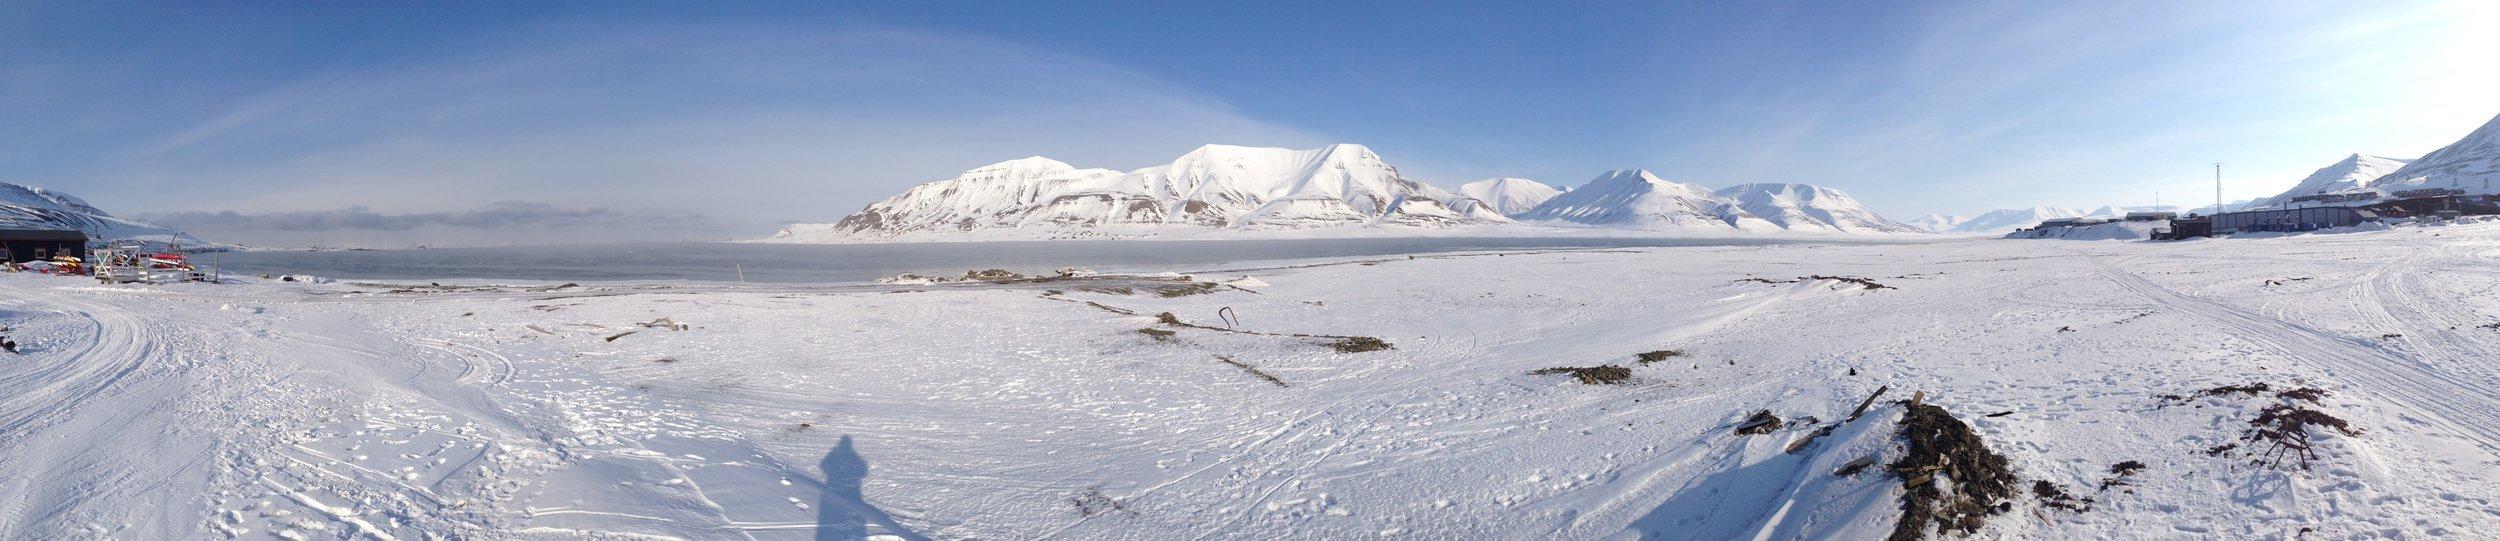 longyearbyen-panorama.jpg